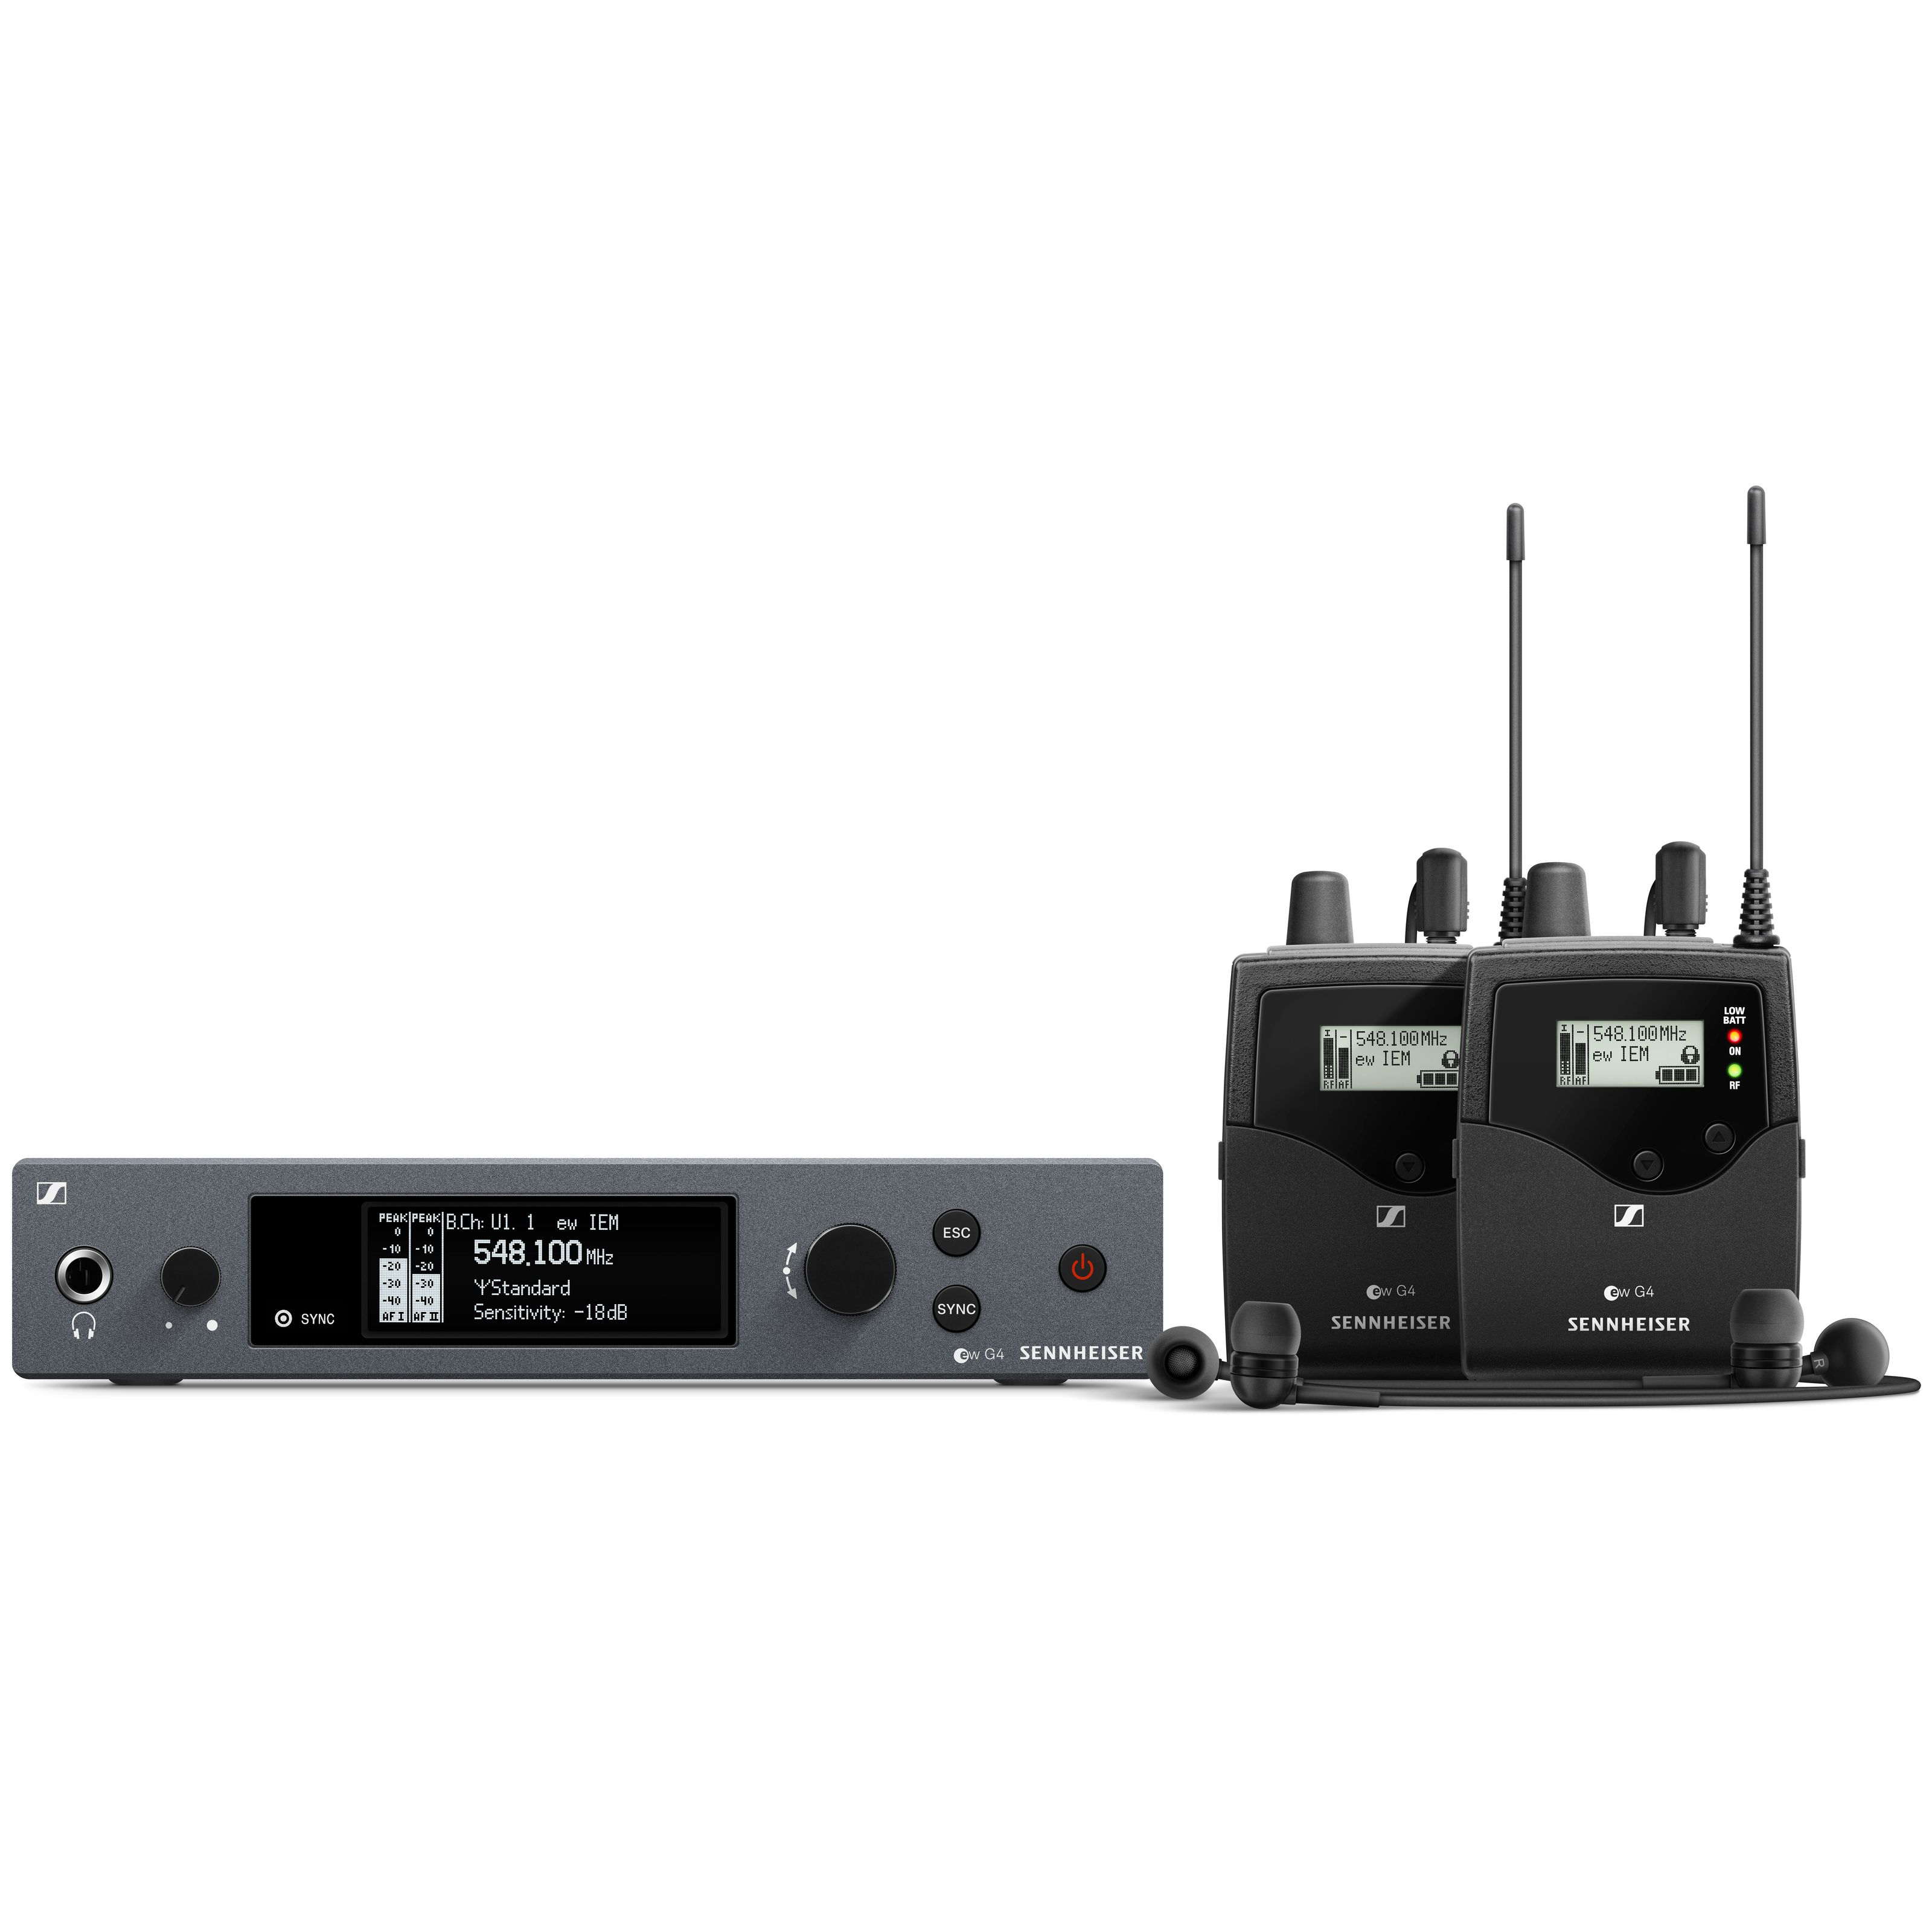 Sennheiser - ew IEM G4-TWIN-A Wireless Monitor Twin Set 507836